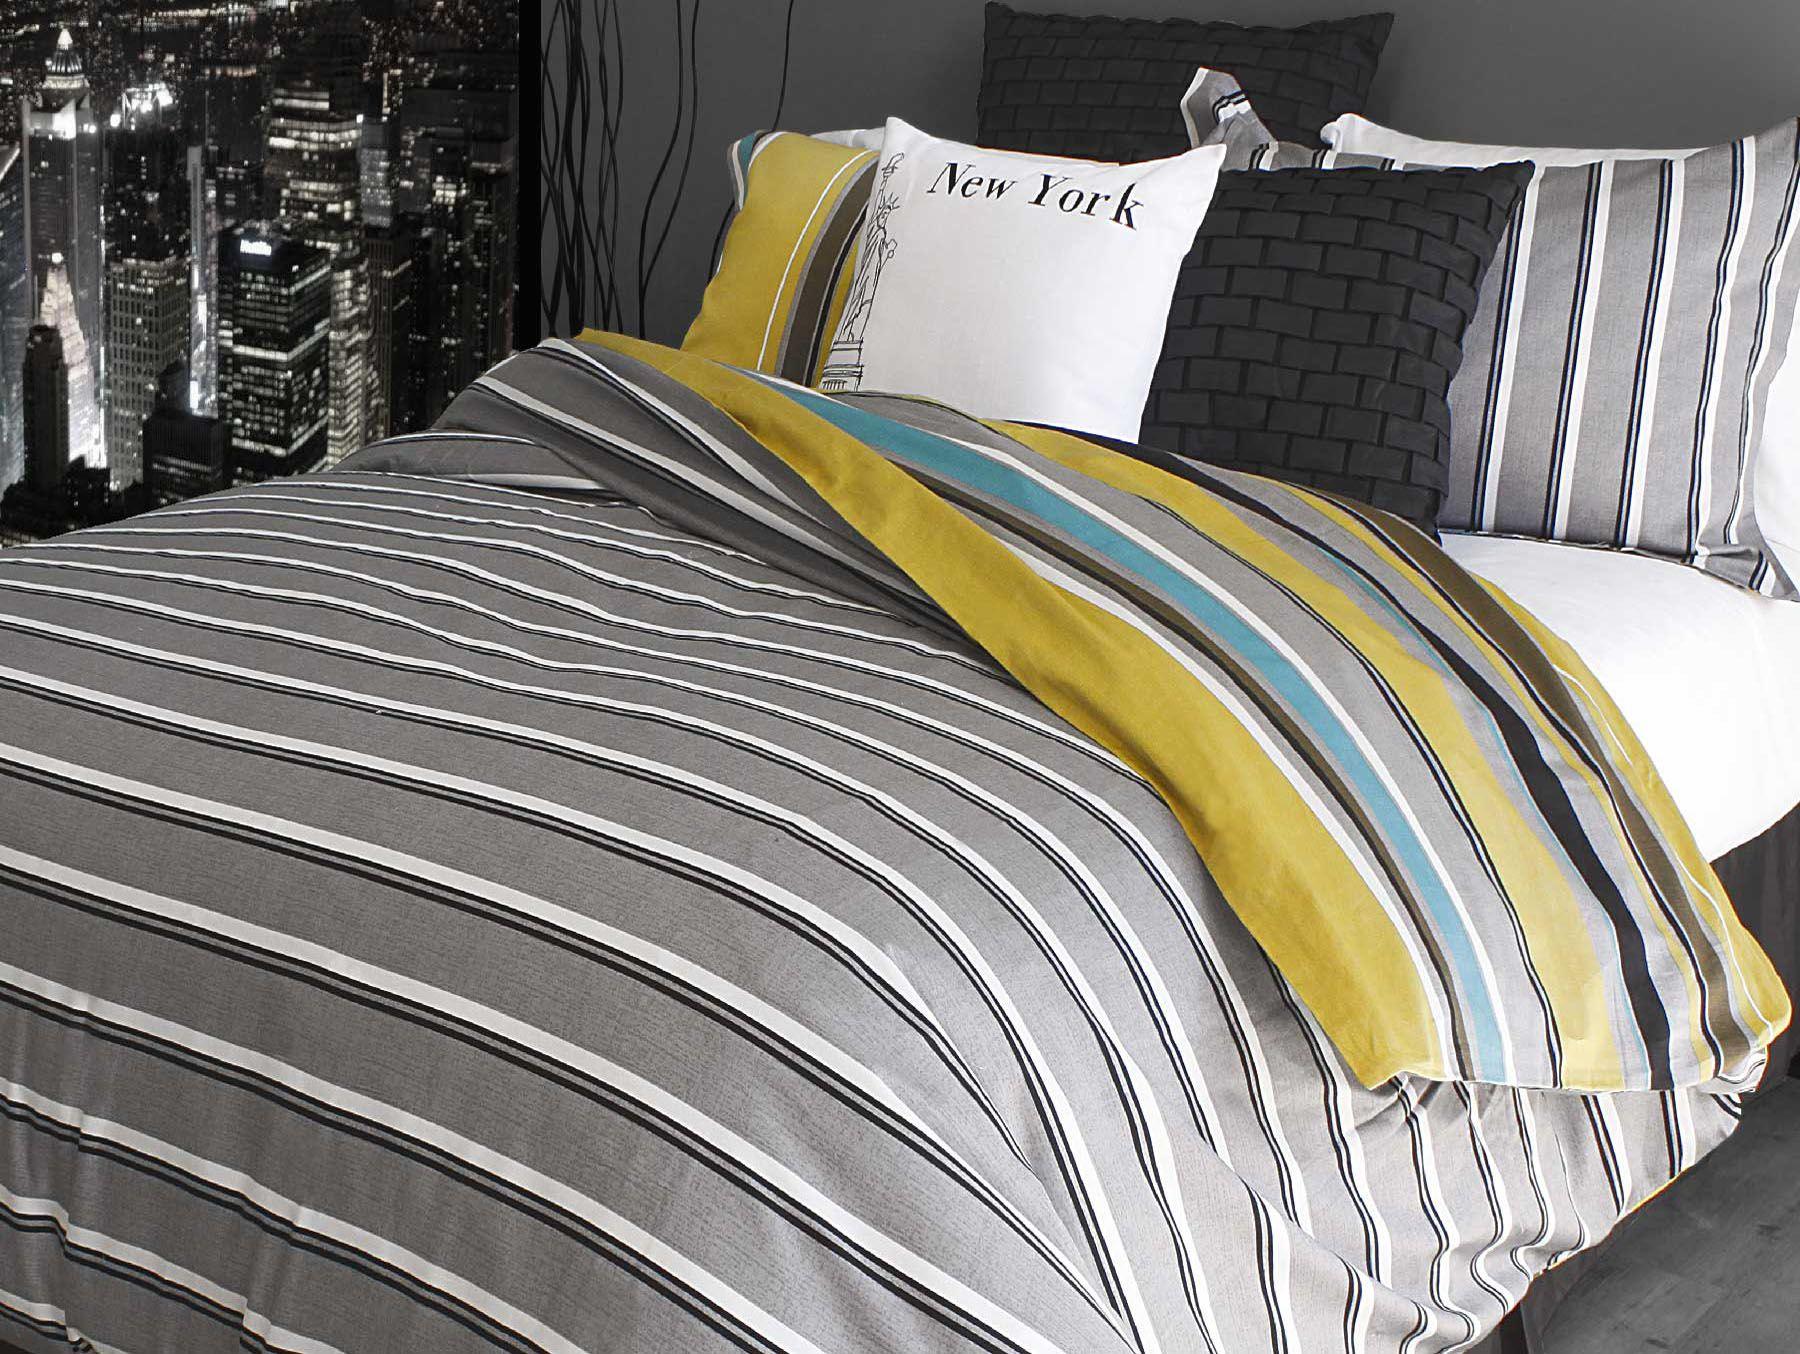 Jordan (Duvet Cover and Shams) Home, Bed spreads